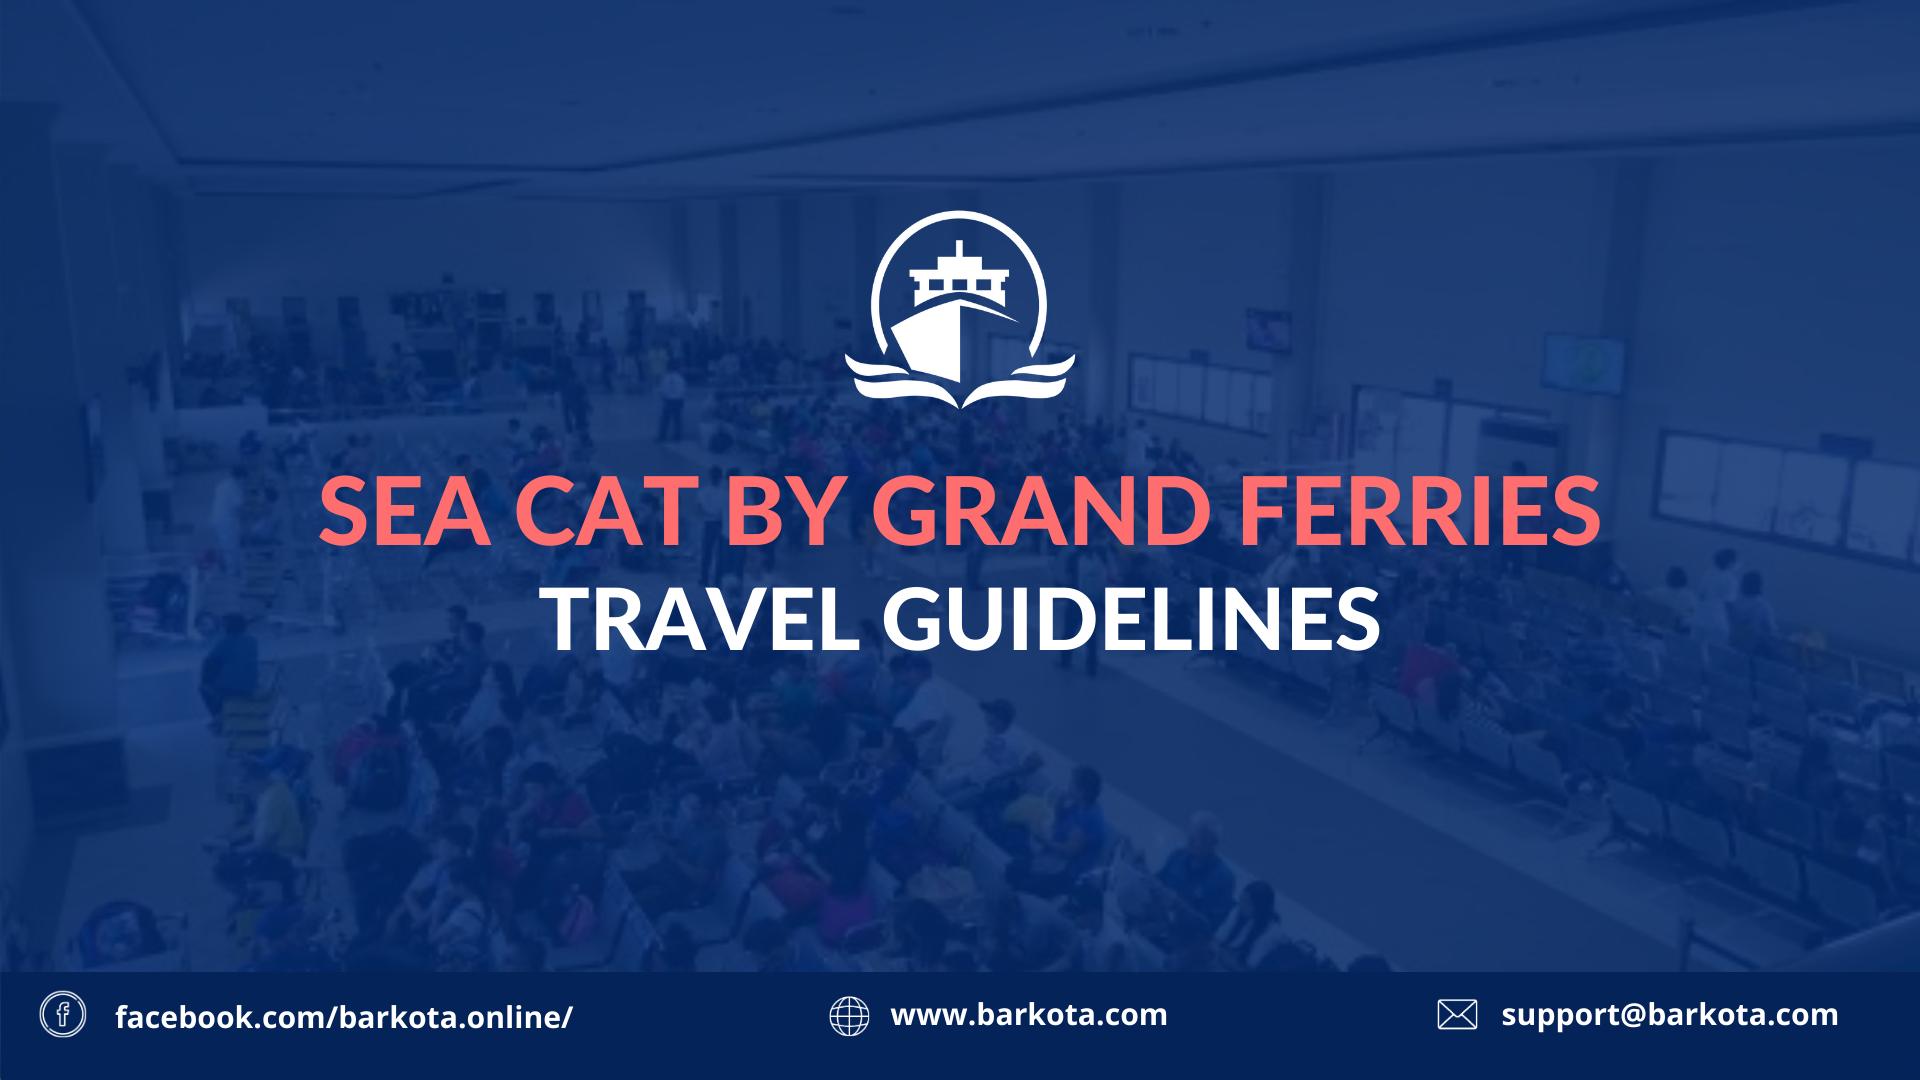 Sea Cat Travel Guidelines